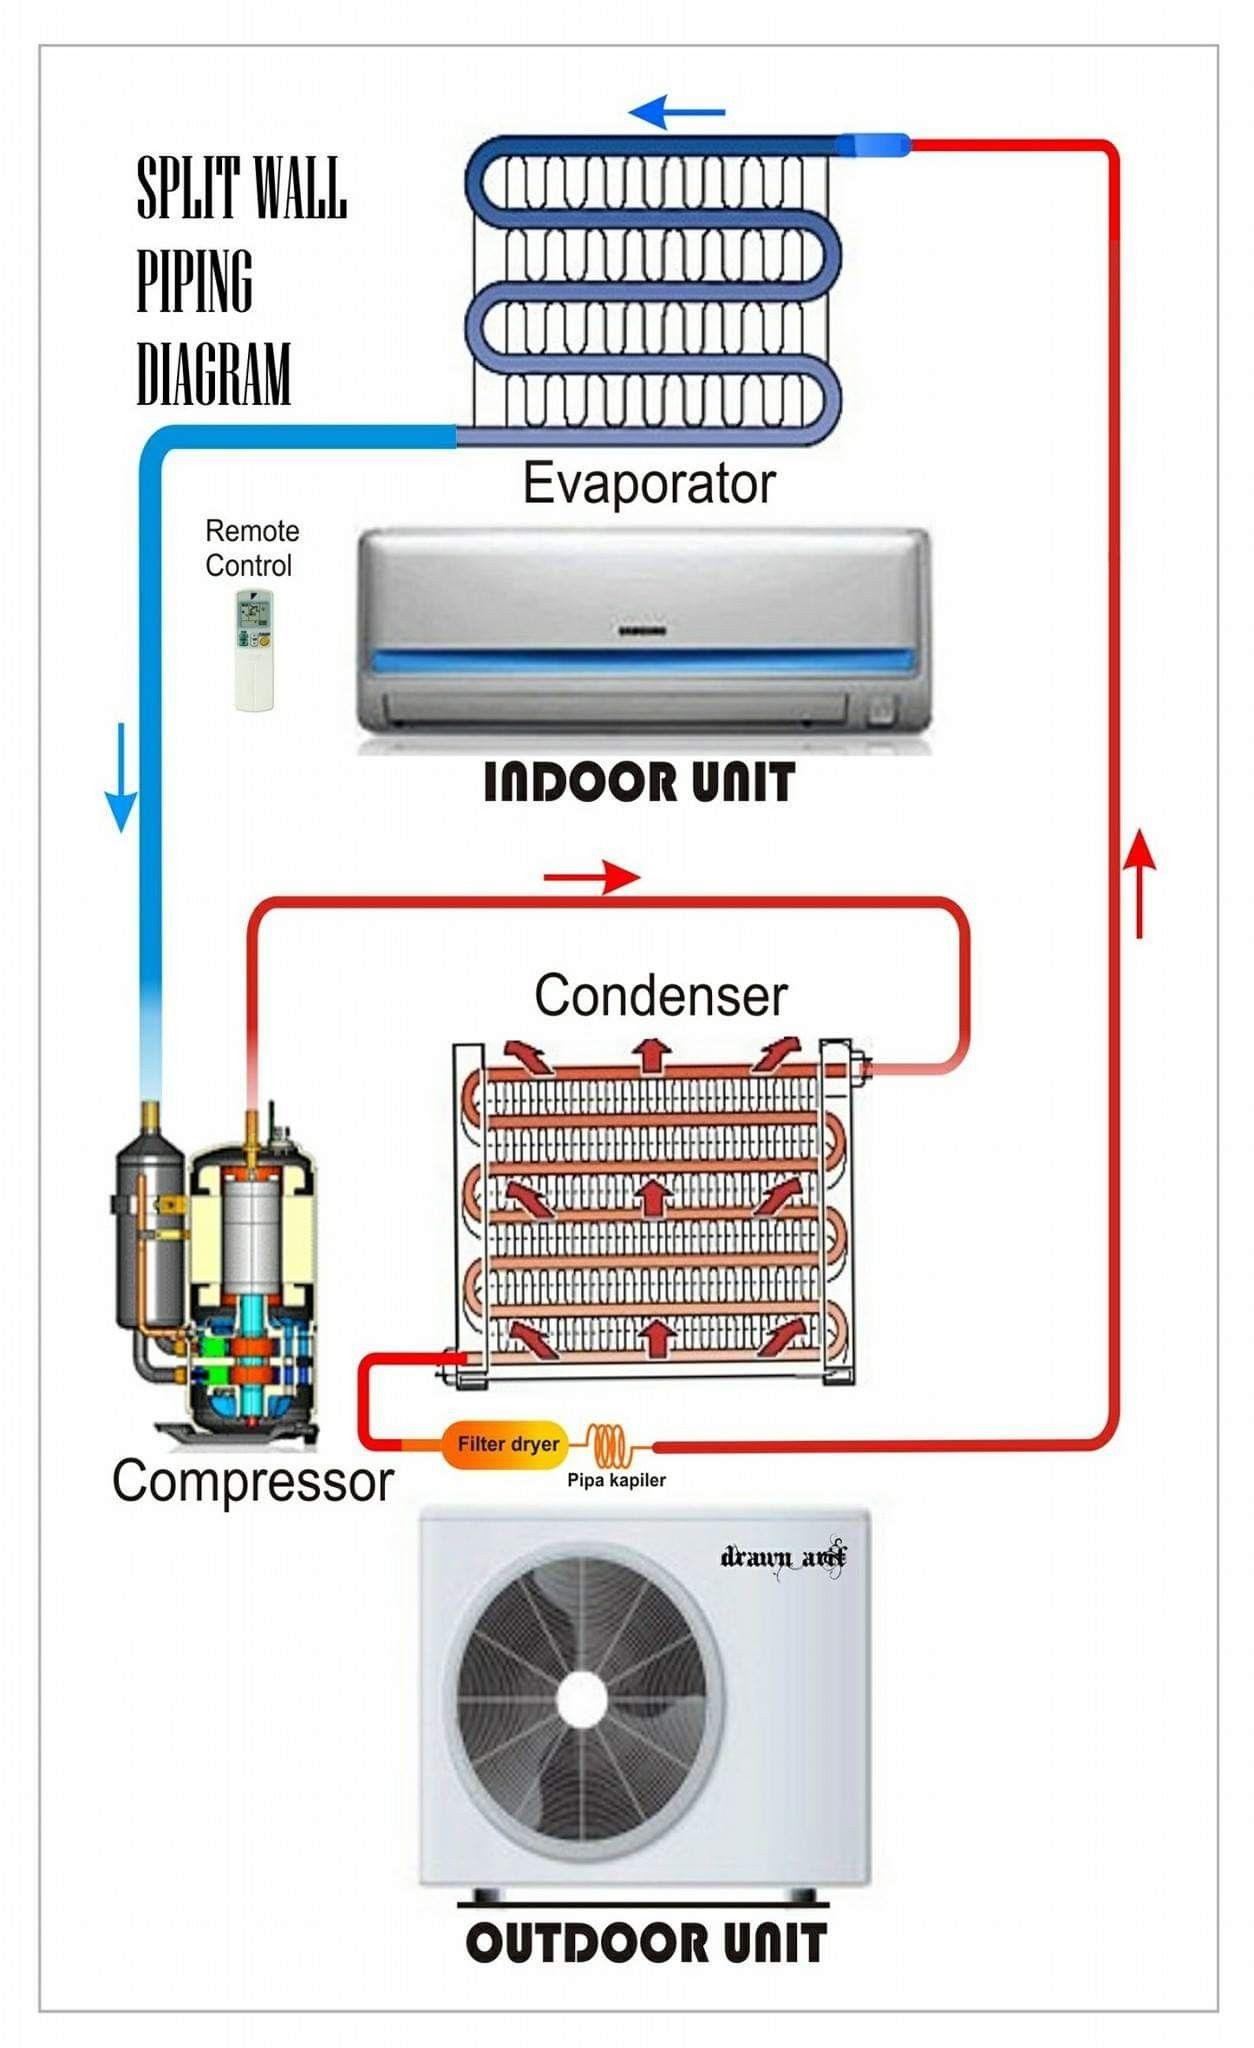 split wall piping diagram air conditioning system in 2019 split wall piping diagram [ 1254 x 2048 Pixel ]